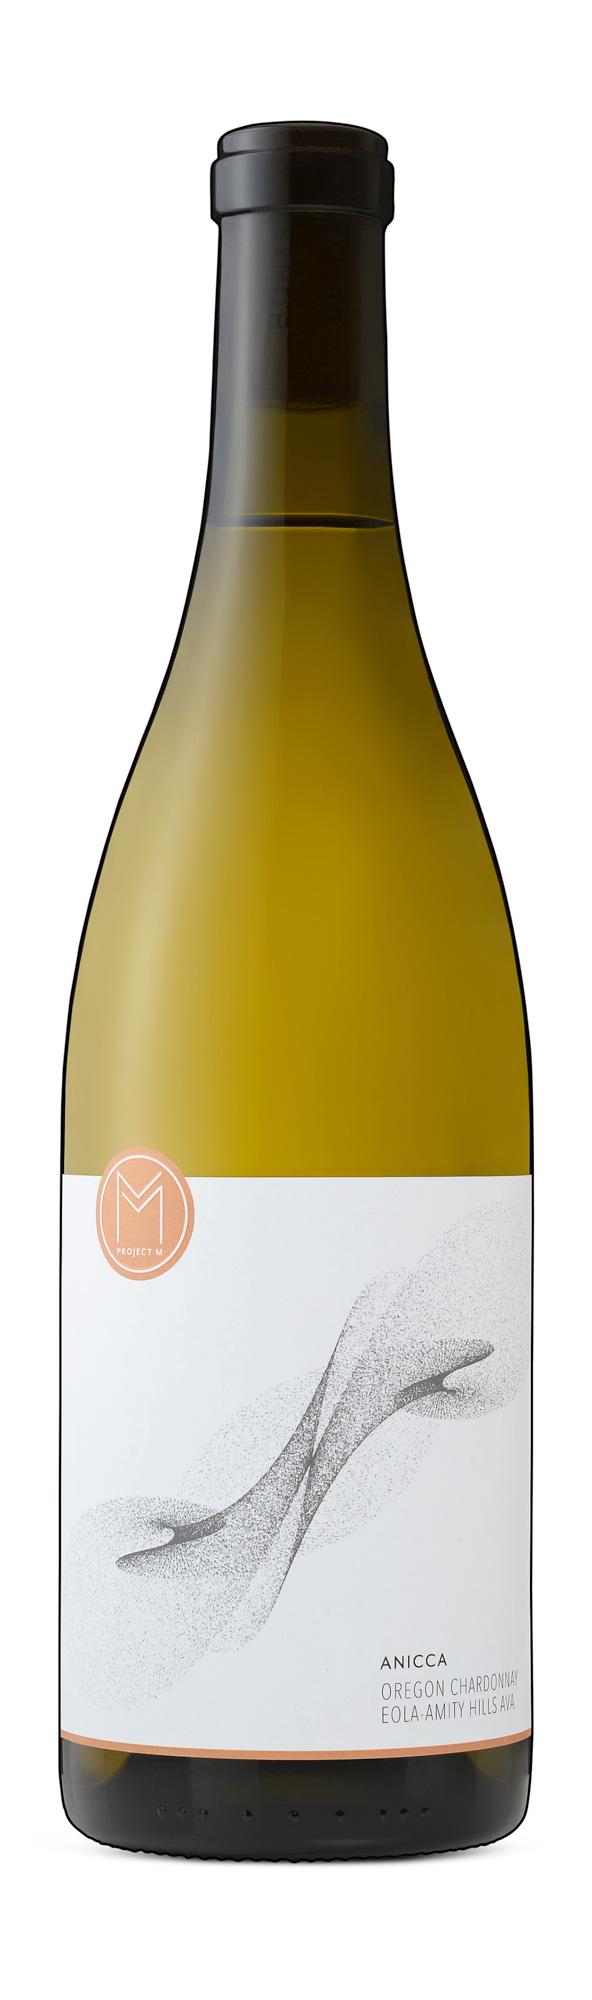 ANNICA 2017 Chardonnay $38